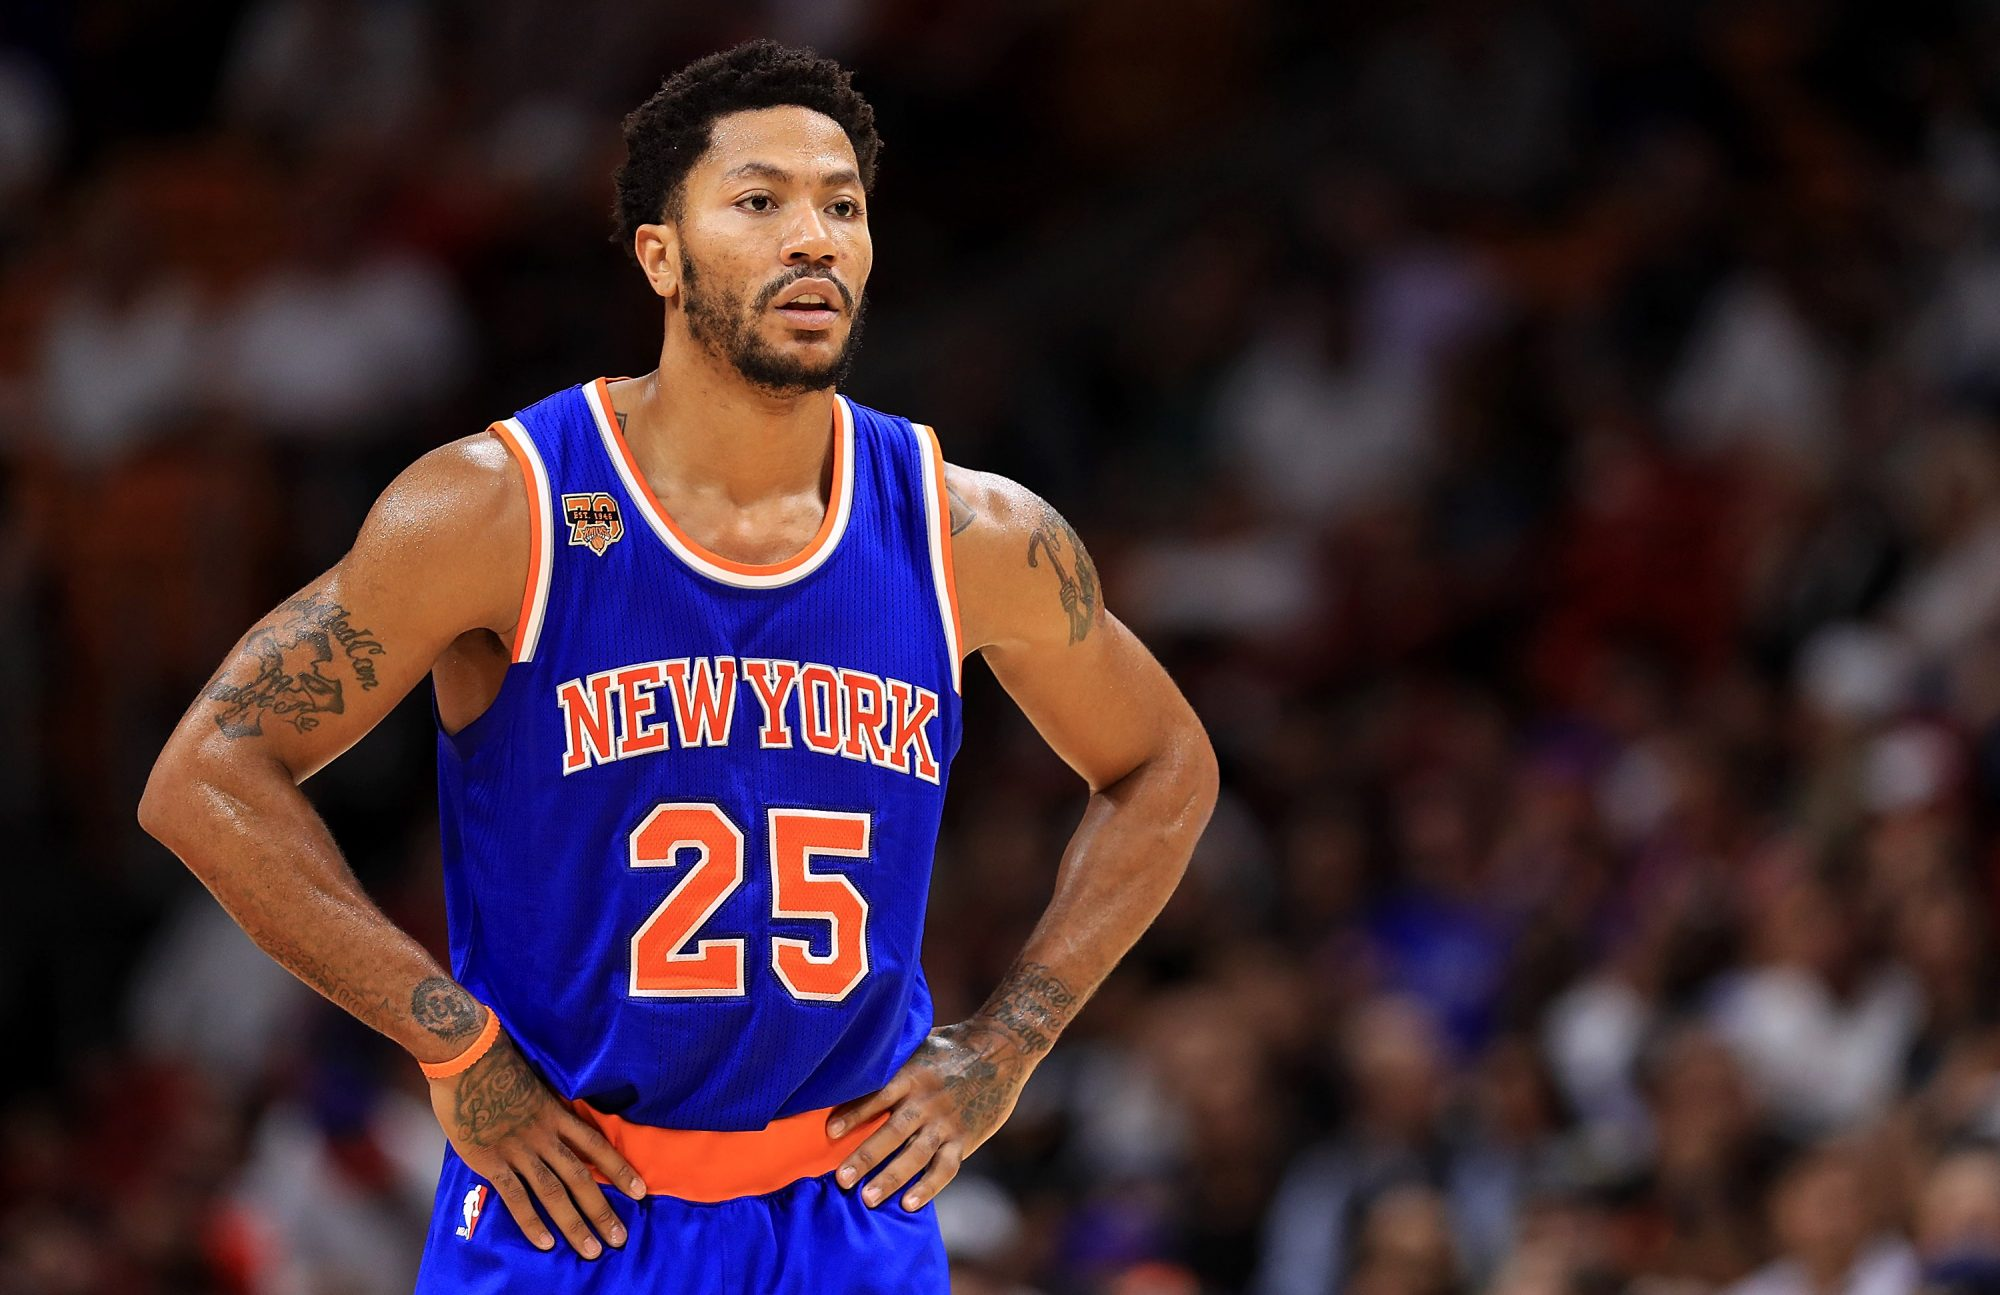 New York Knicks Daily News Mix, 8/29/17: Derrick Rose Talks NY Craziness